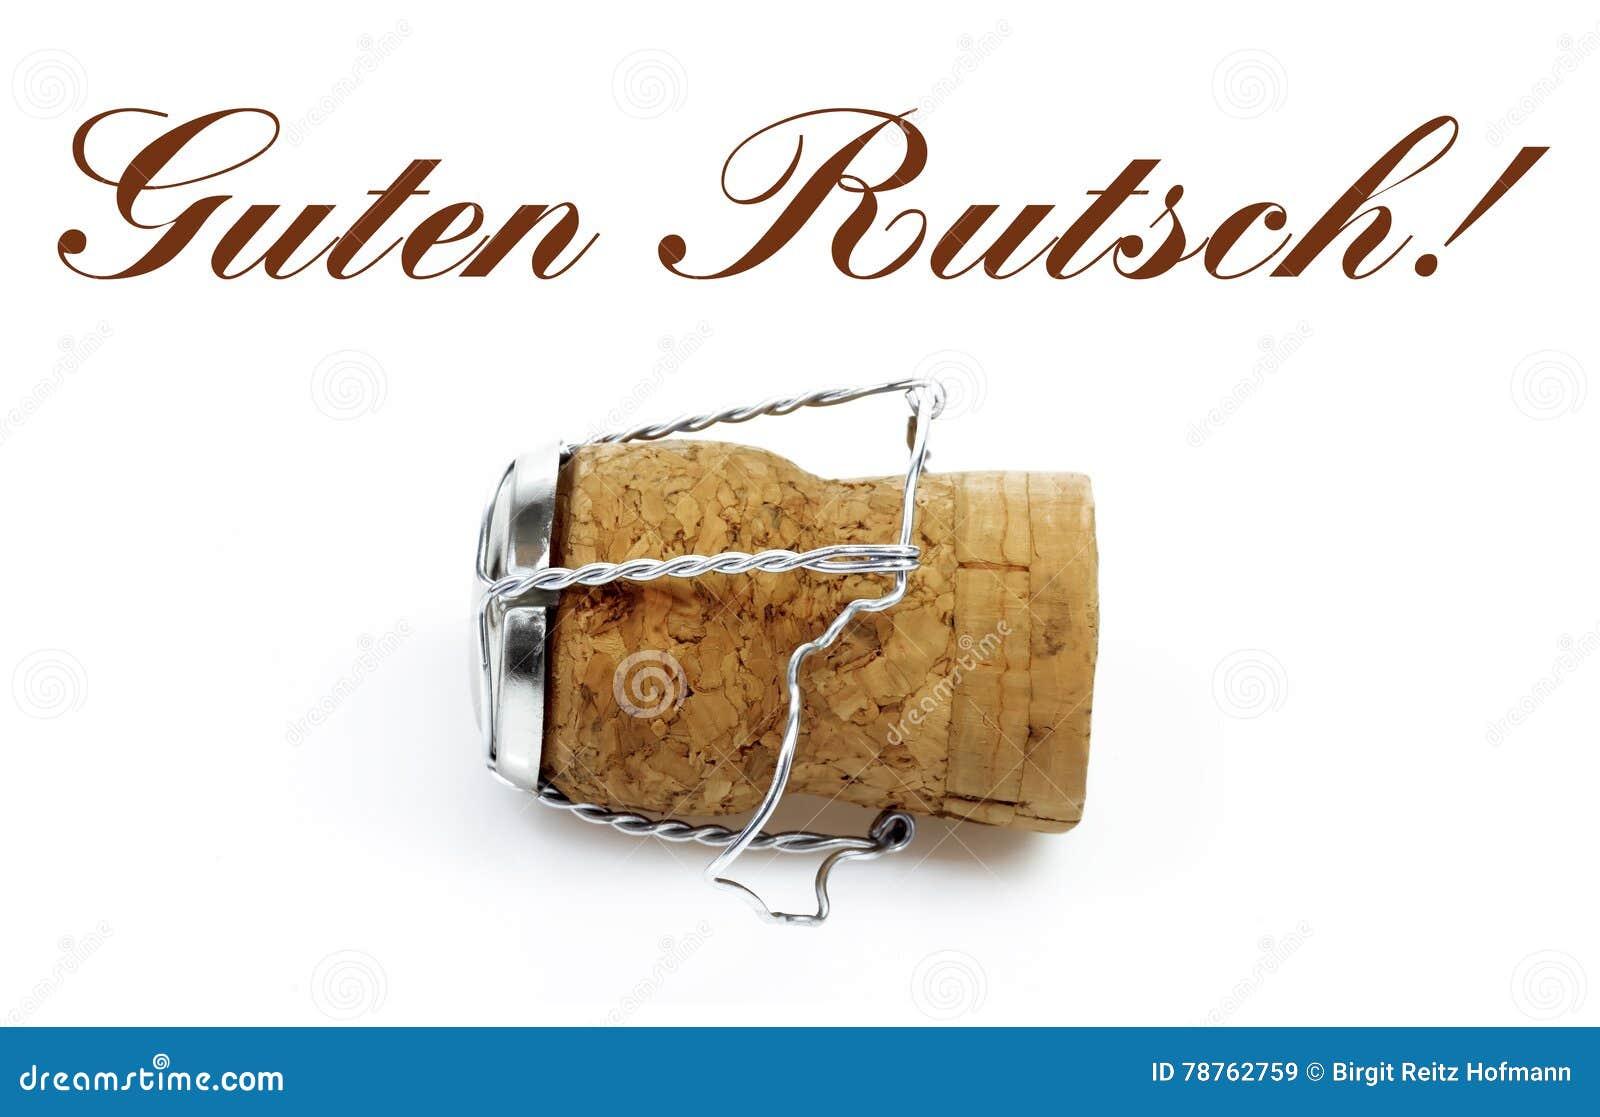 German language happy new year stock image image of toast german language happy new year m4hsunfo